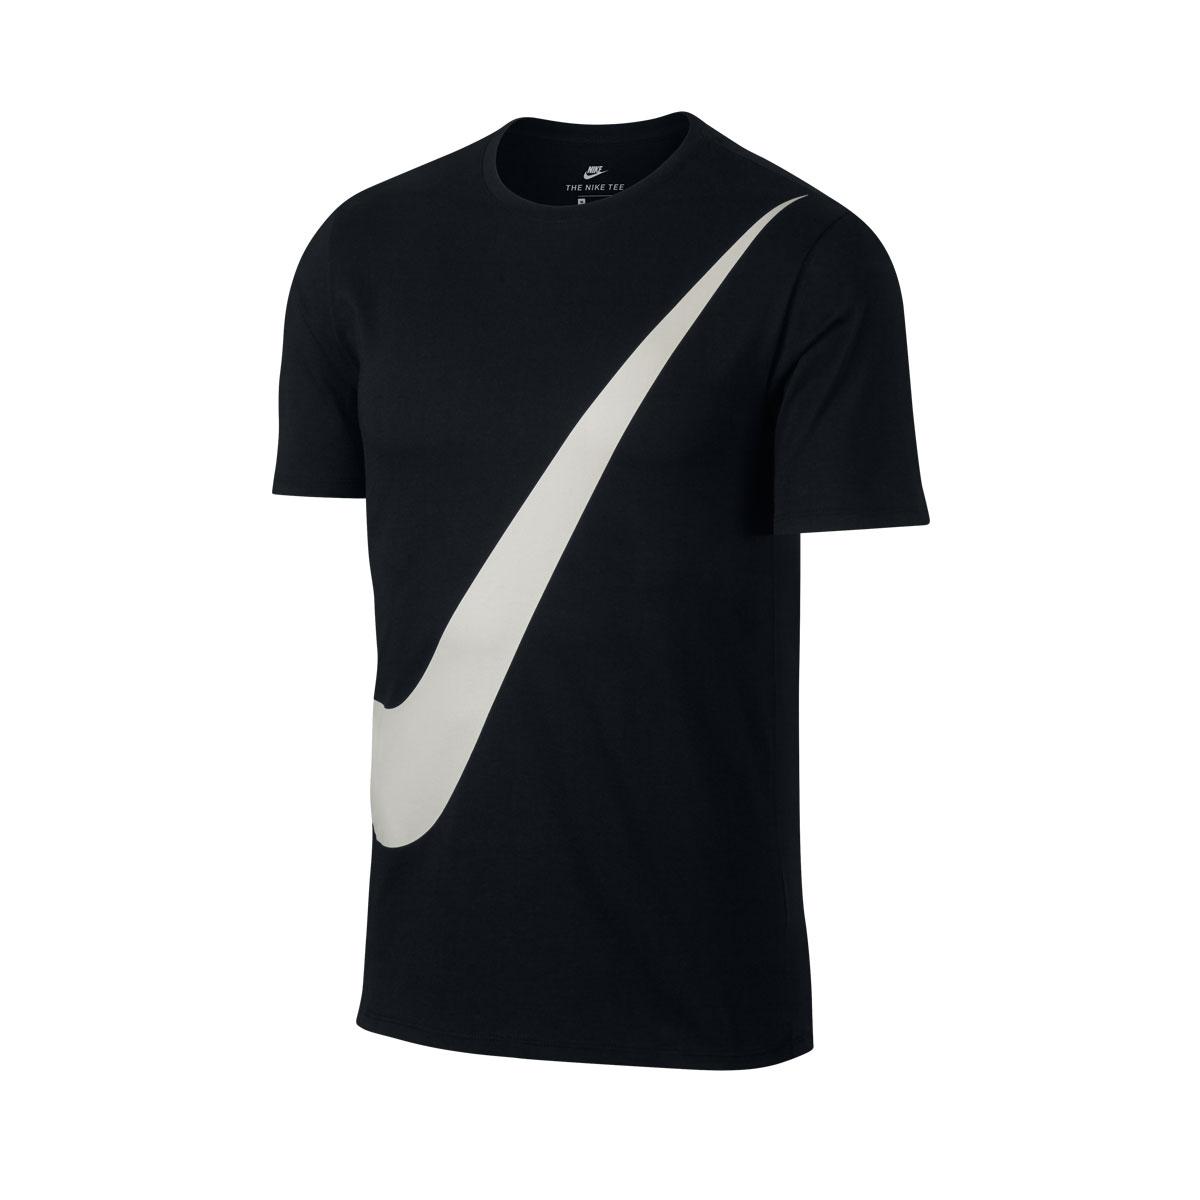 NIKE AS M NSW TEE HYBRID 1 (Nike hybrid T shirt 1) BLACKLIGHT BONE 18SP I